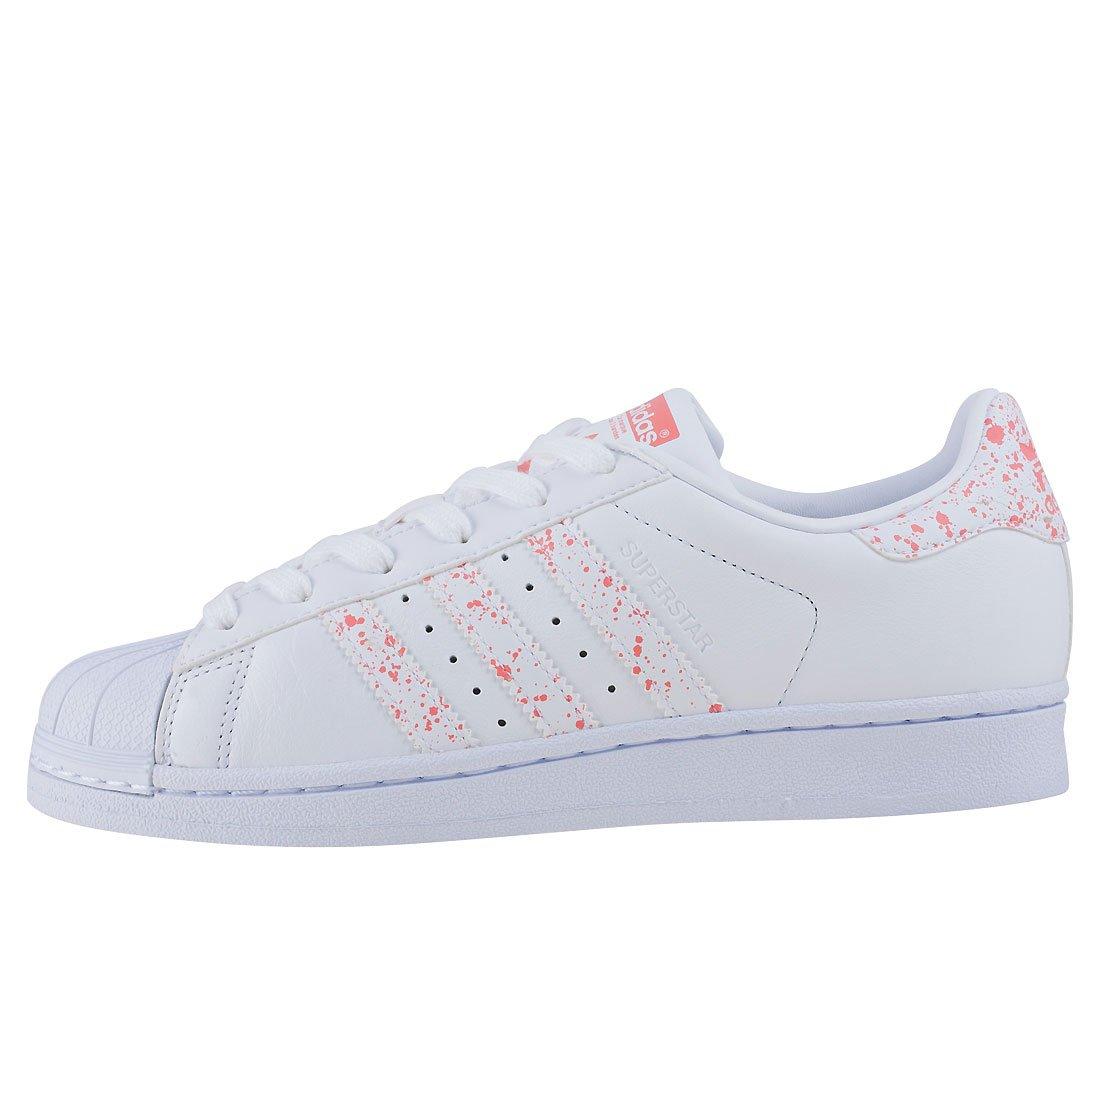 Blanc Adidas Fitness Femme Chaussures W Multicolore De Superstar n4wA0pB4q